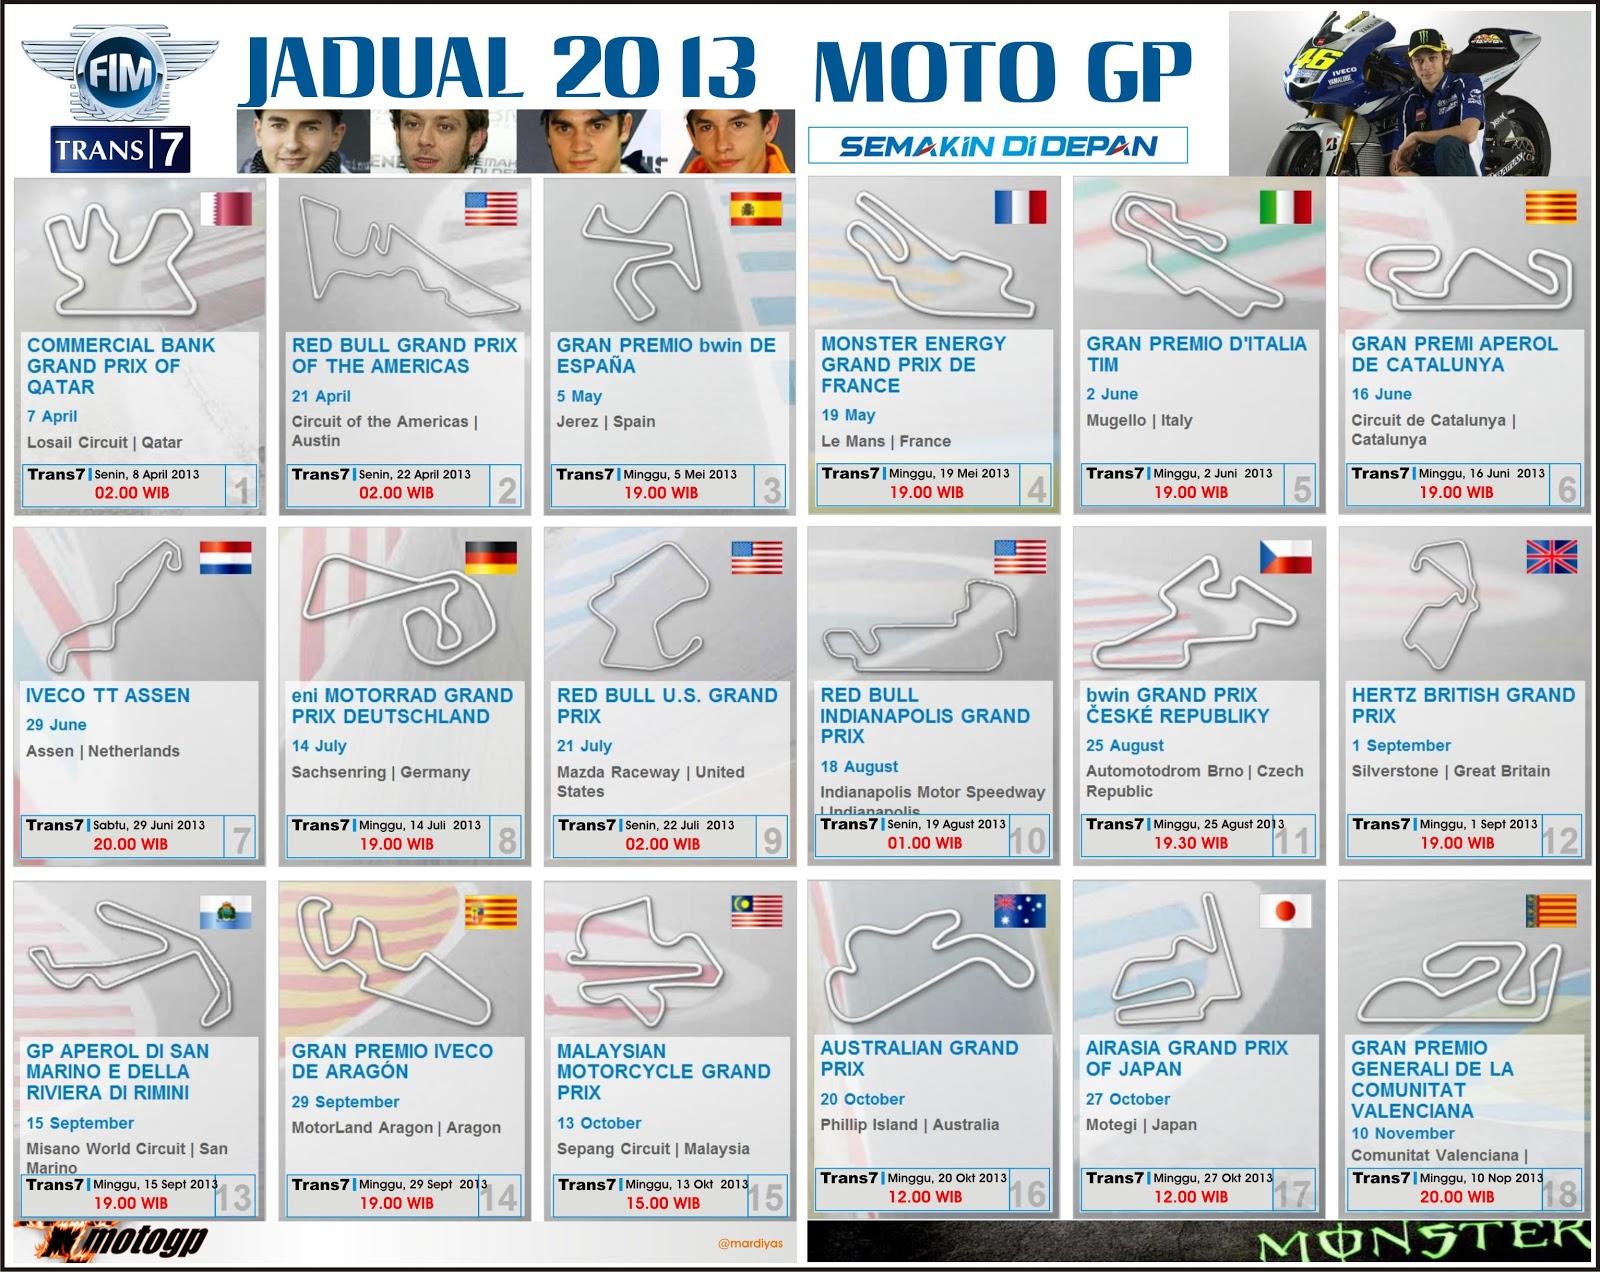 Jadual Motogp 2013 Lengkap Trans7 Tik Sma 4 Jember